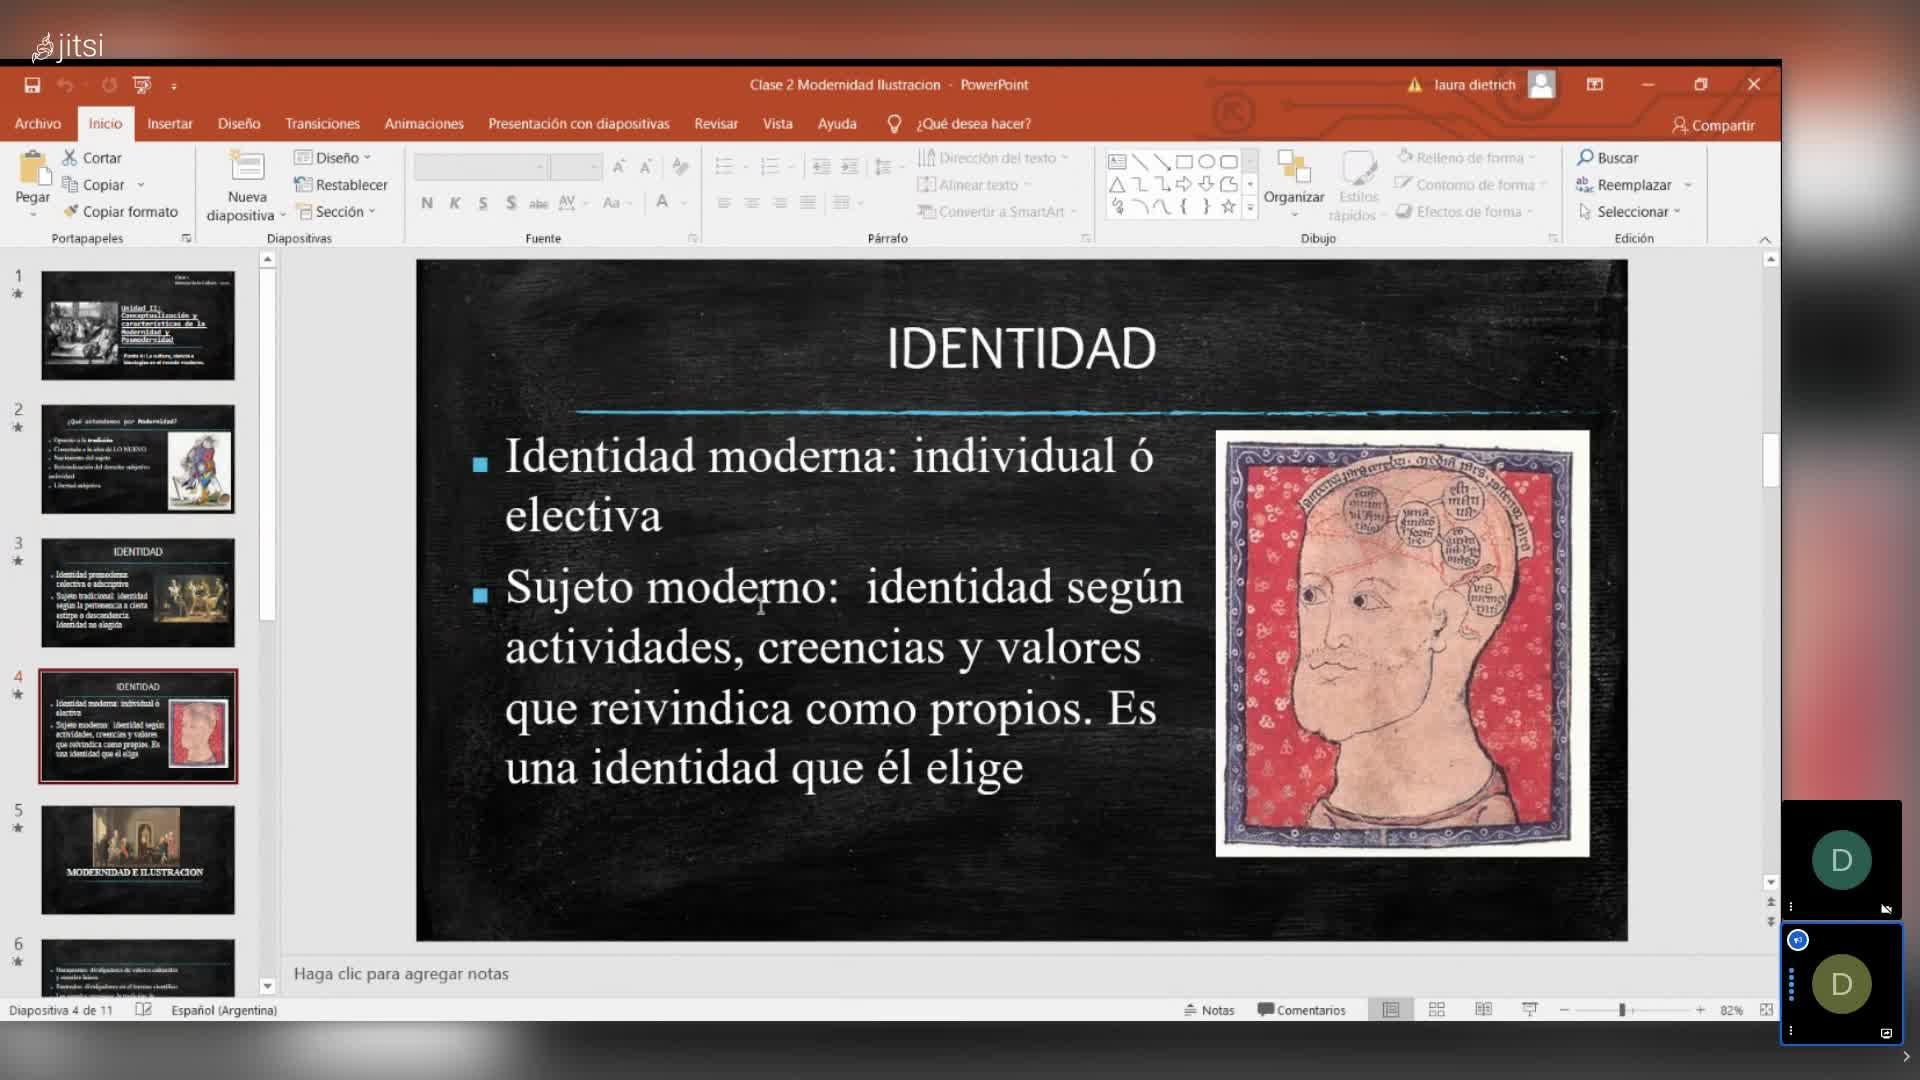 Clase 2 teórica Historia de la Cultura 27/04/21